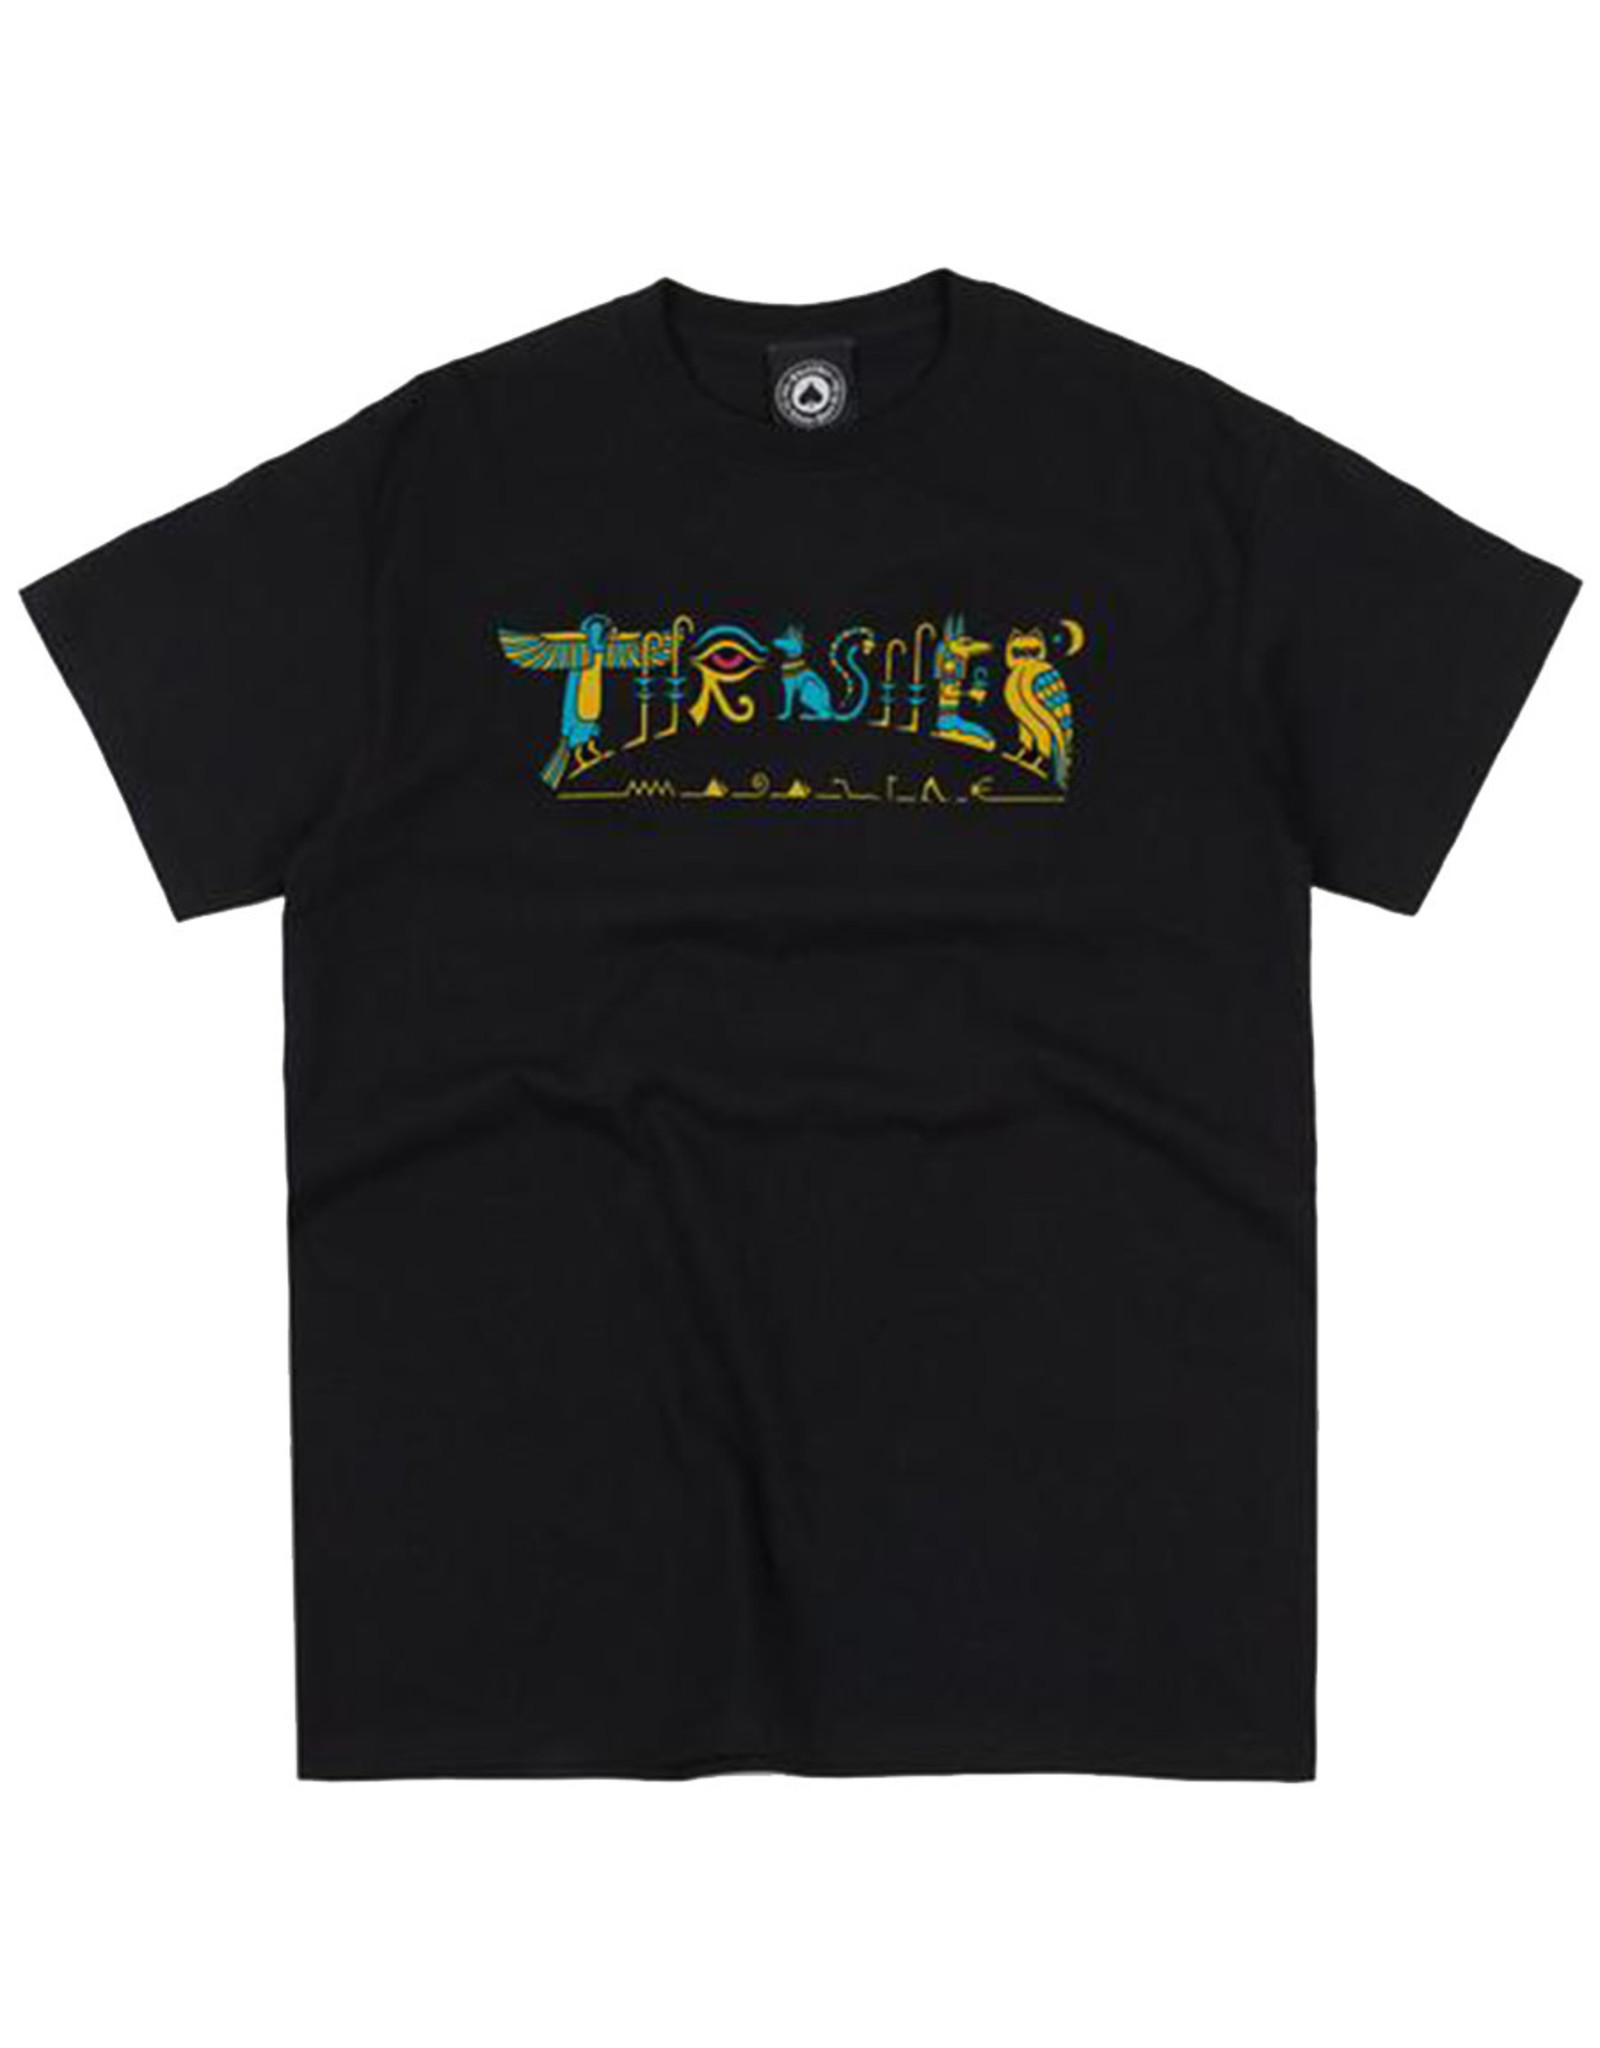 Thrasher Thrasher Tee Mens Hieroglyphic S/S (Black)